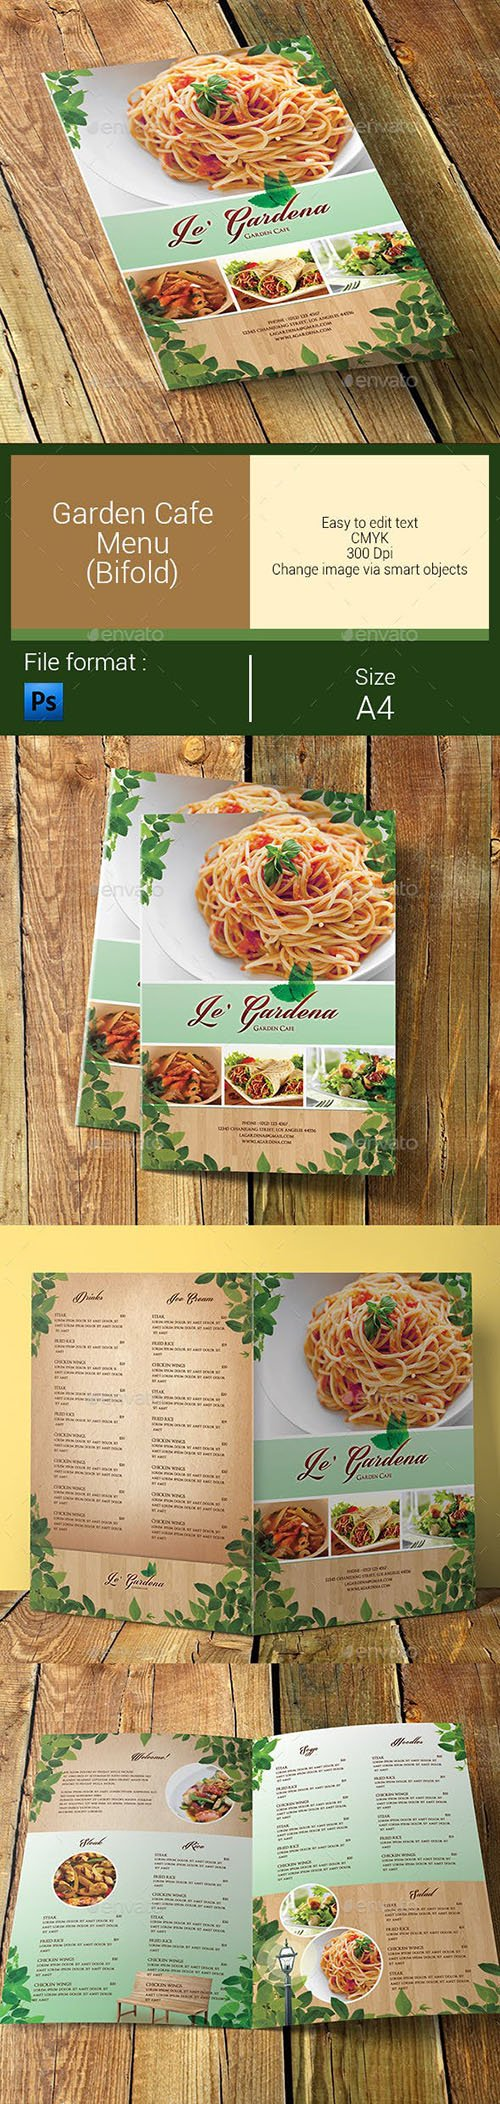 GR - Garden Cafe Menu Bifold 6056468